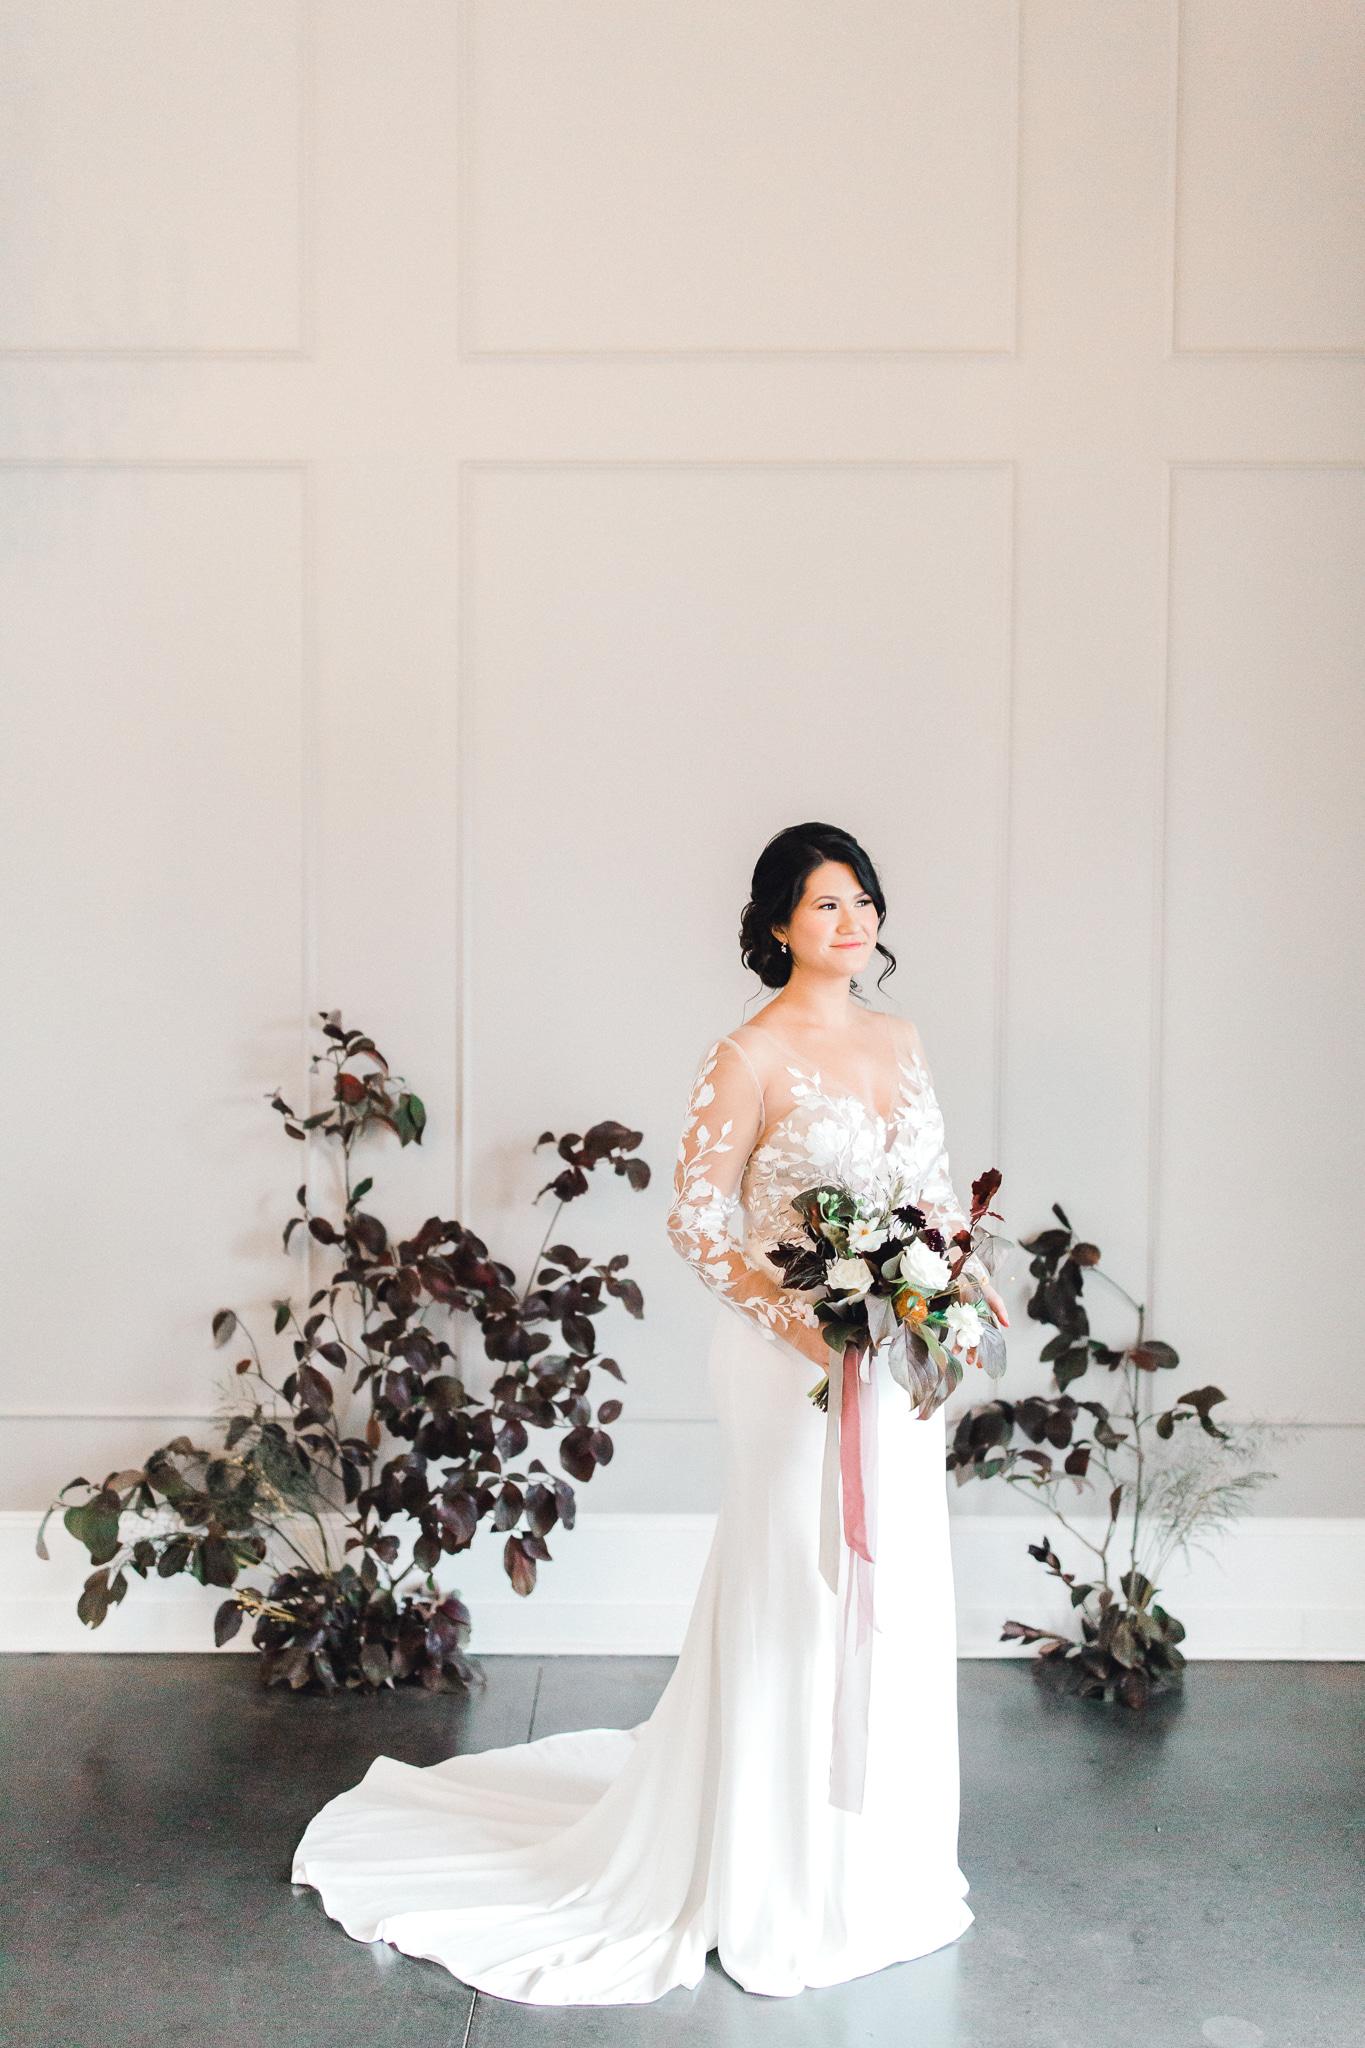 Bride in long sleeved wedding gown